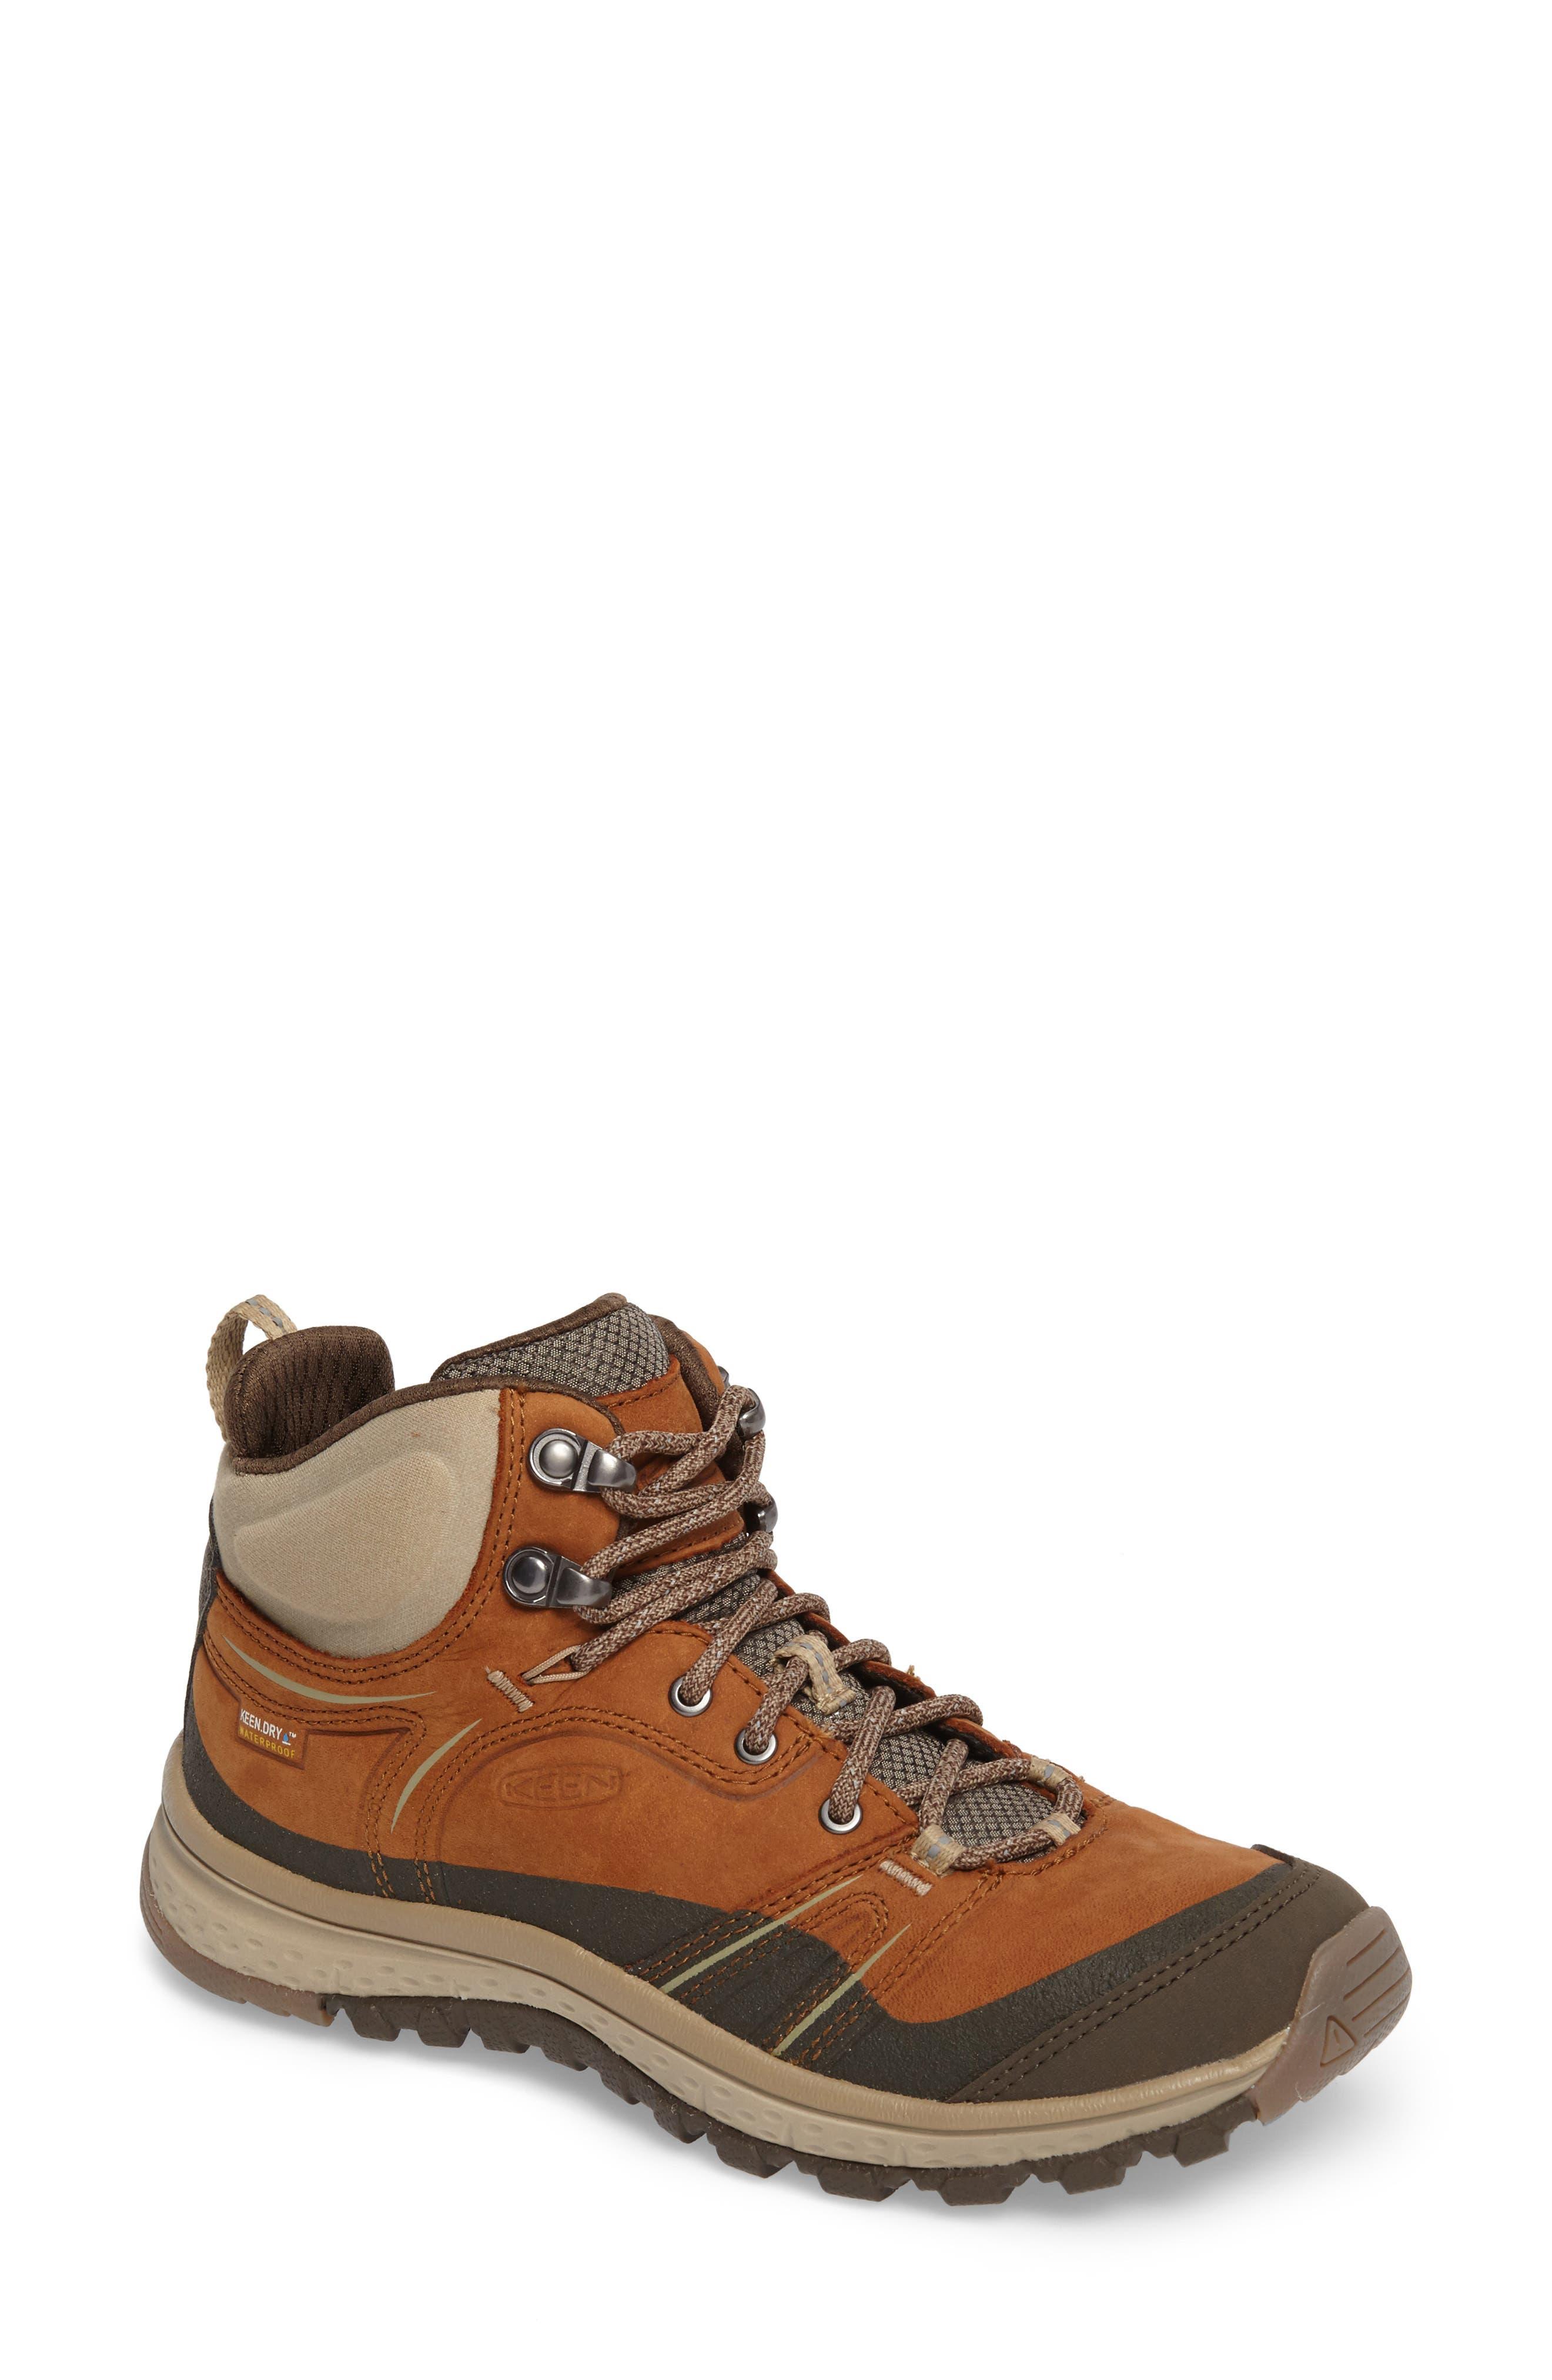 KEEN Terradora Leather Waterproof Hiking Boot, Main, color, TIMBER/ ORANGE NUBUCK